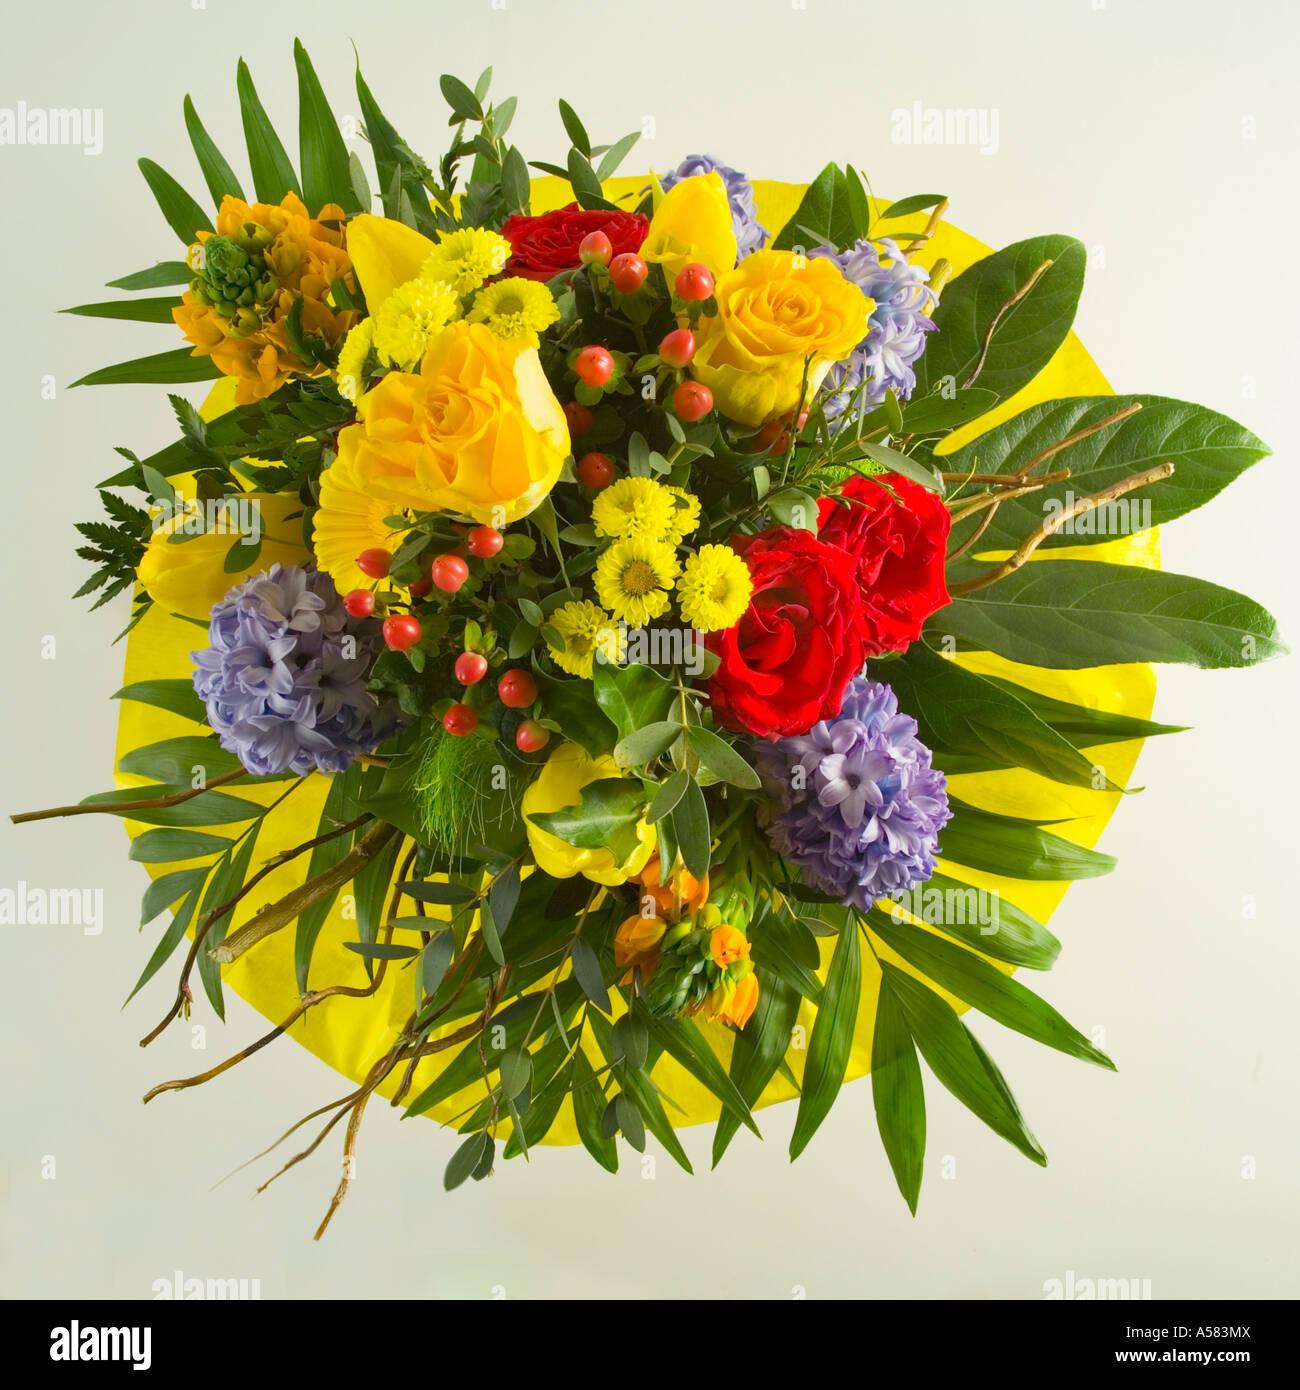 Colourful flower bouquet - Stock Image